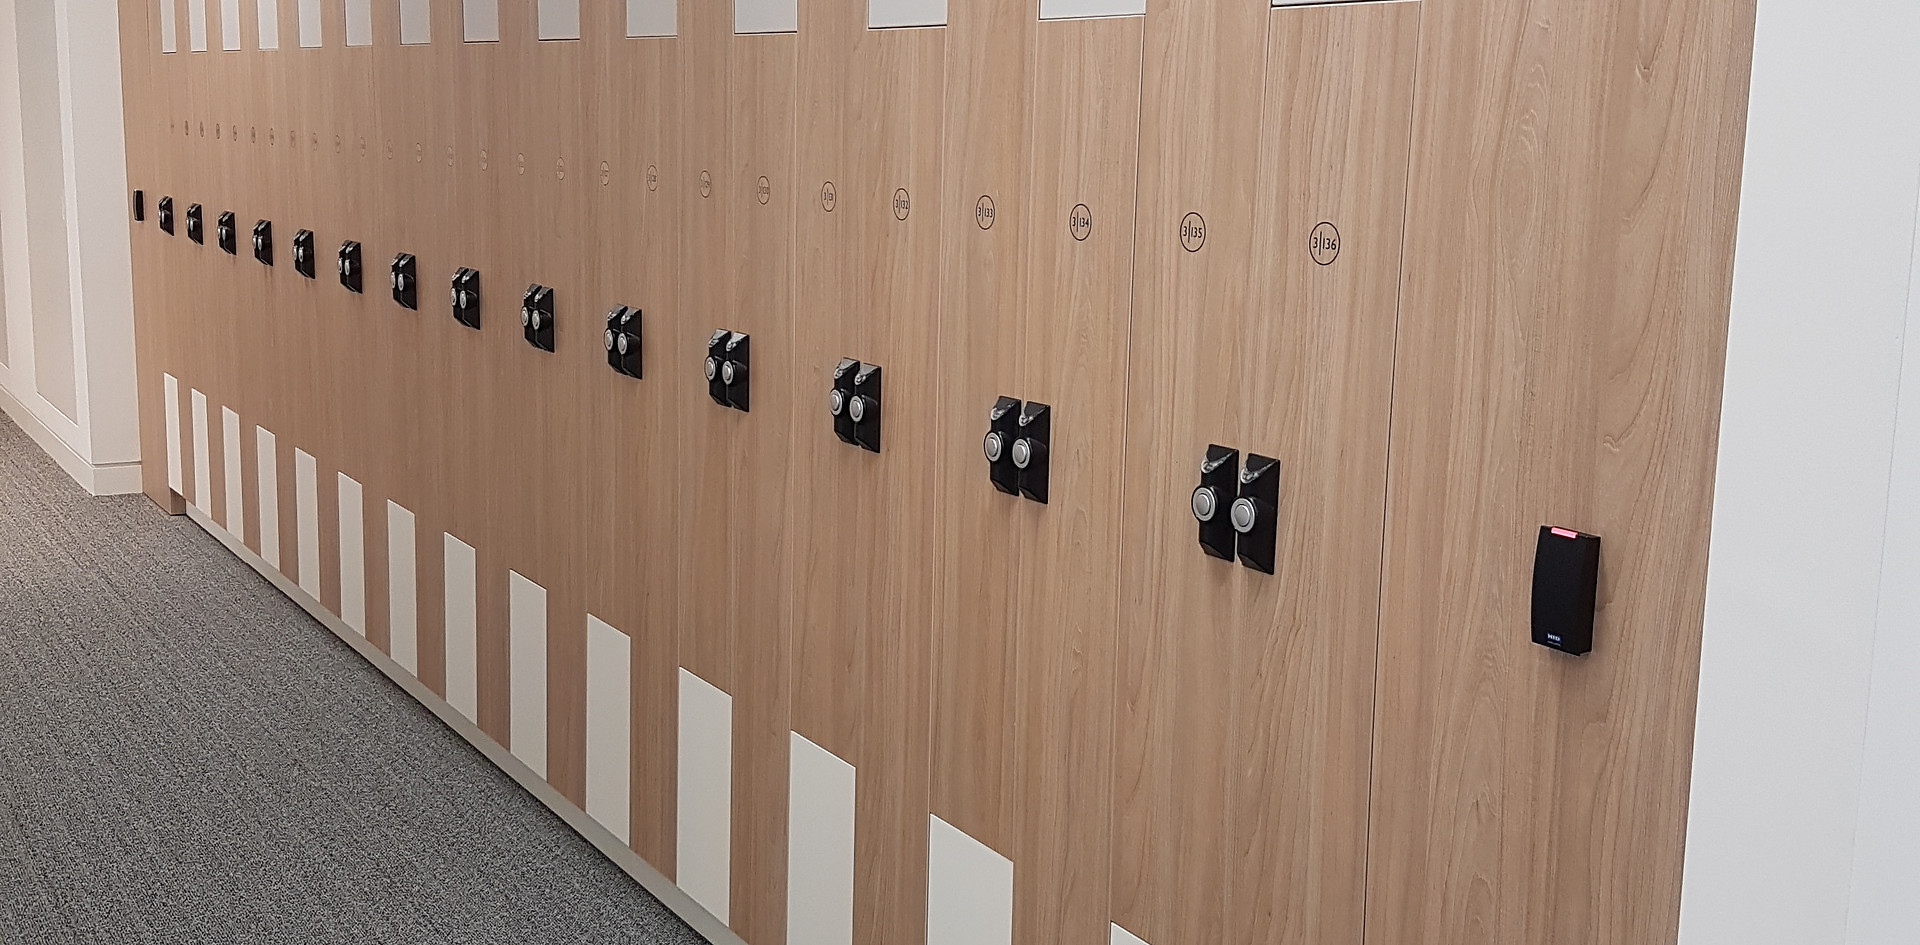 intelligent smart workplace z locker RFID lock card reader remote opening